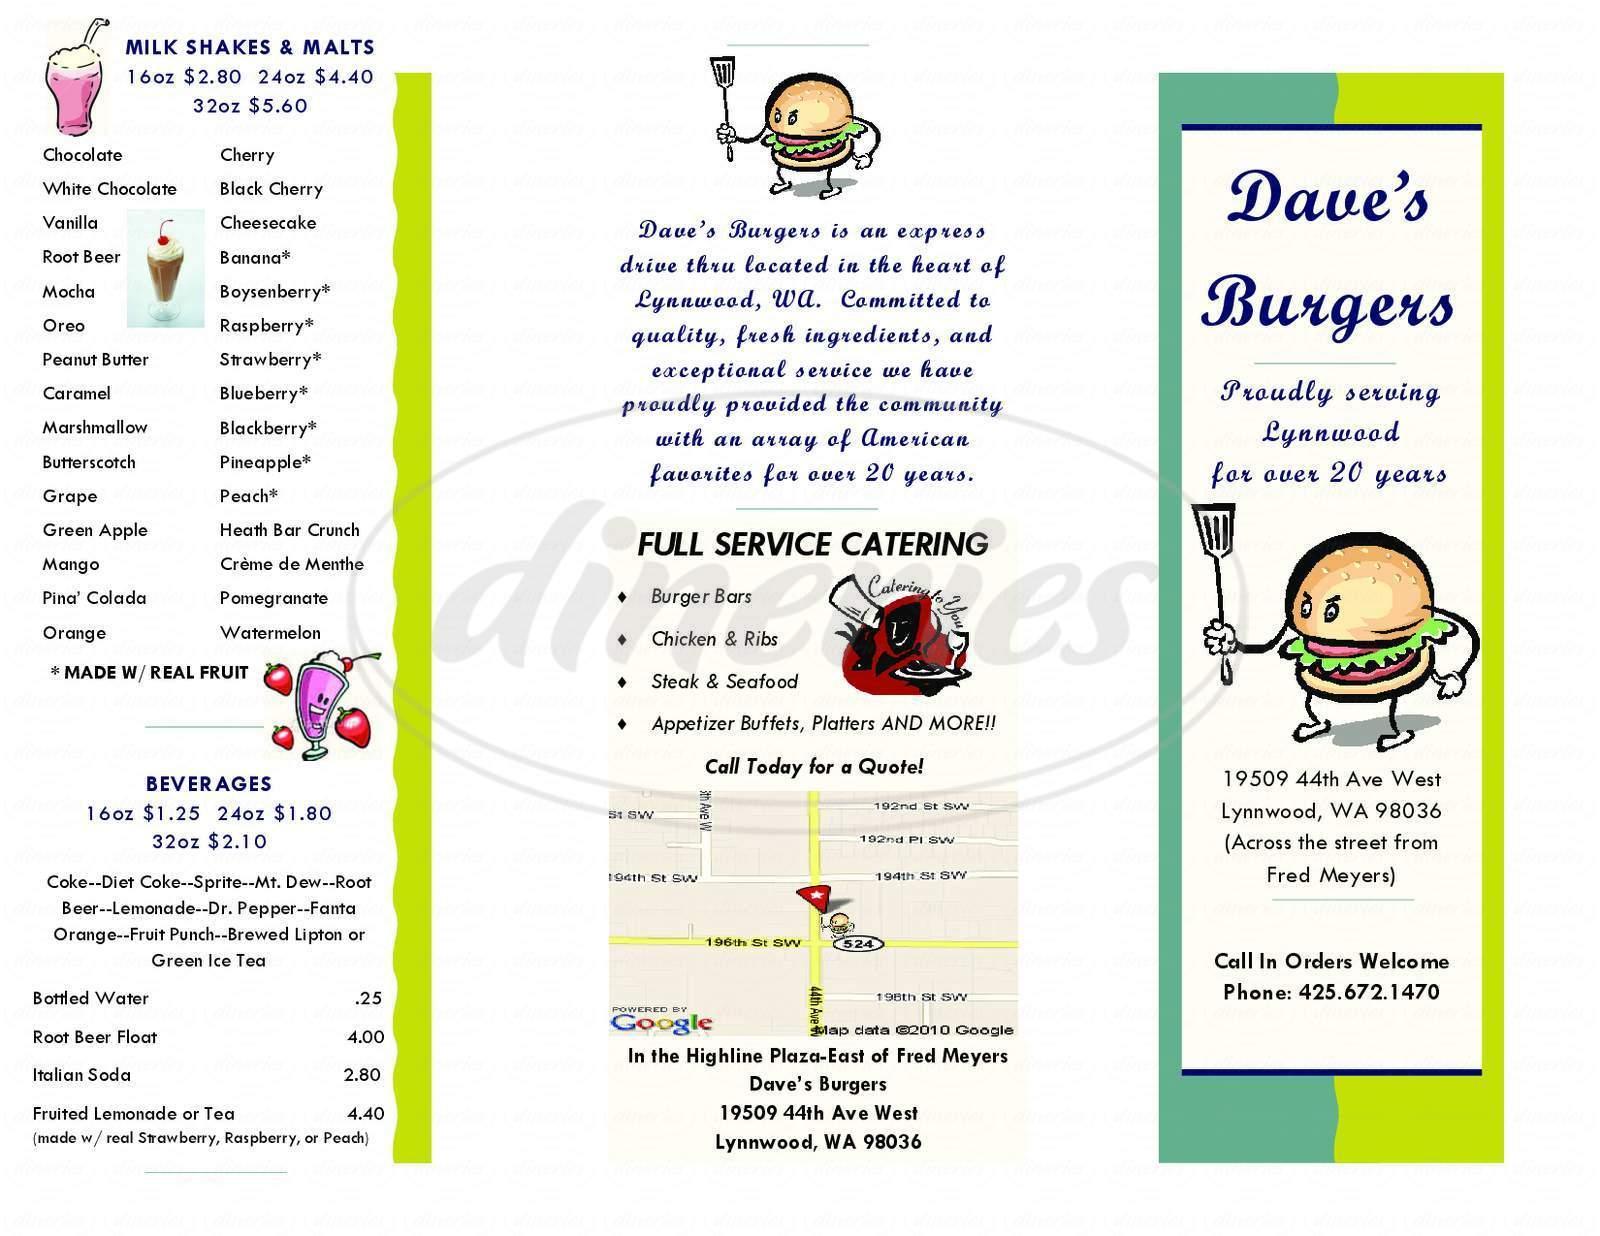 menu for Dave's Burgers